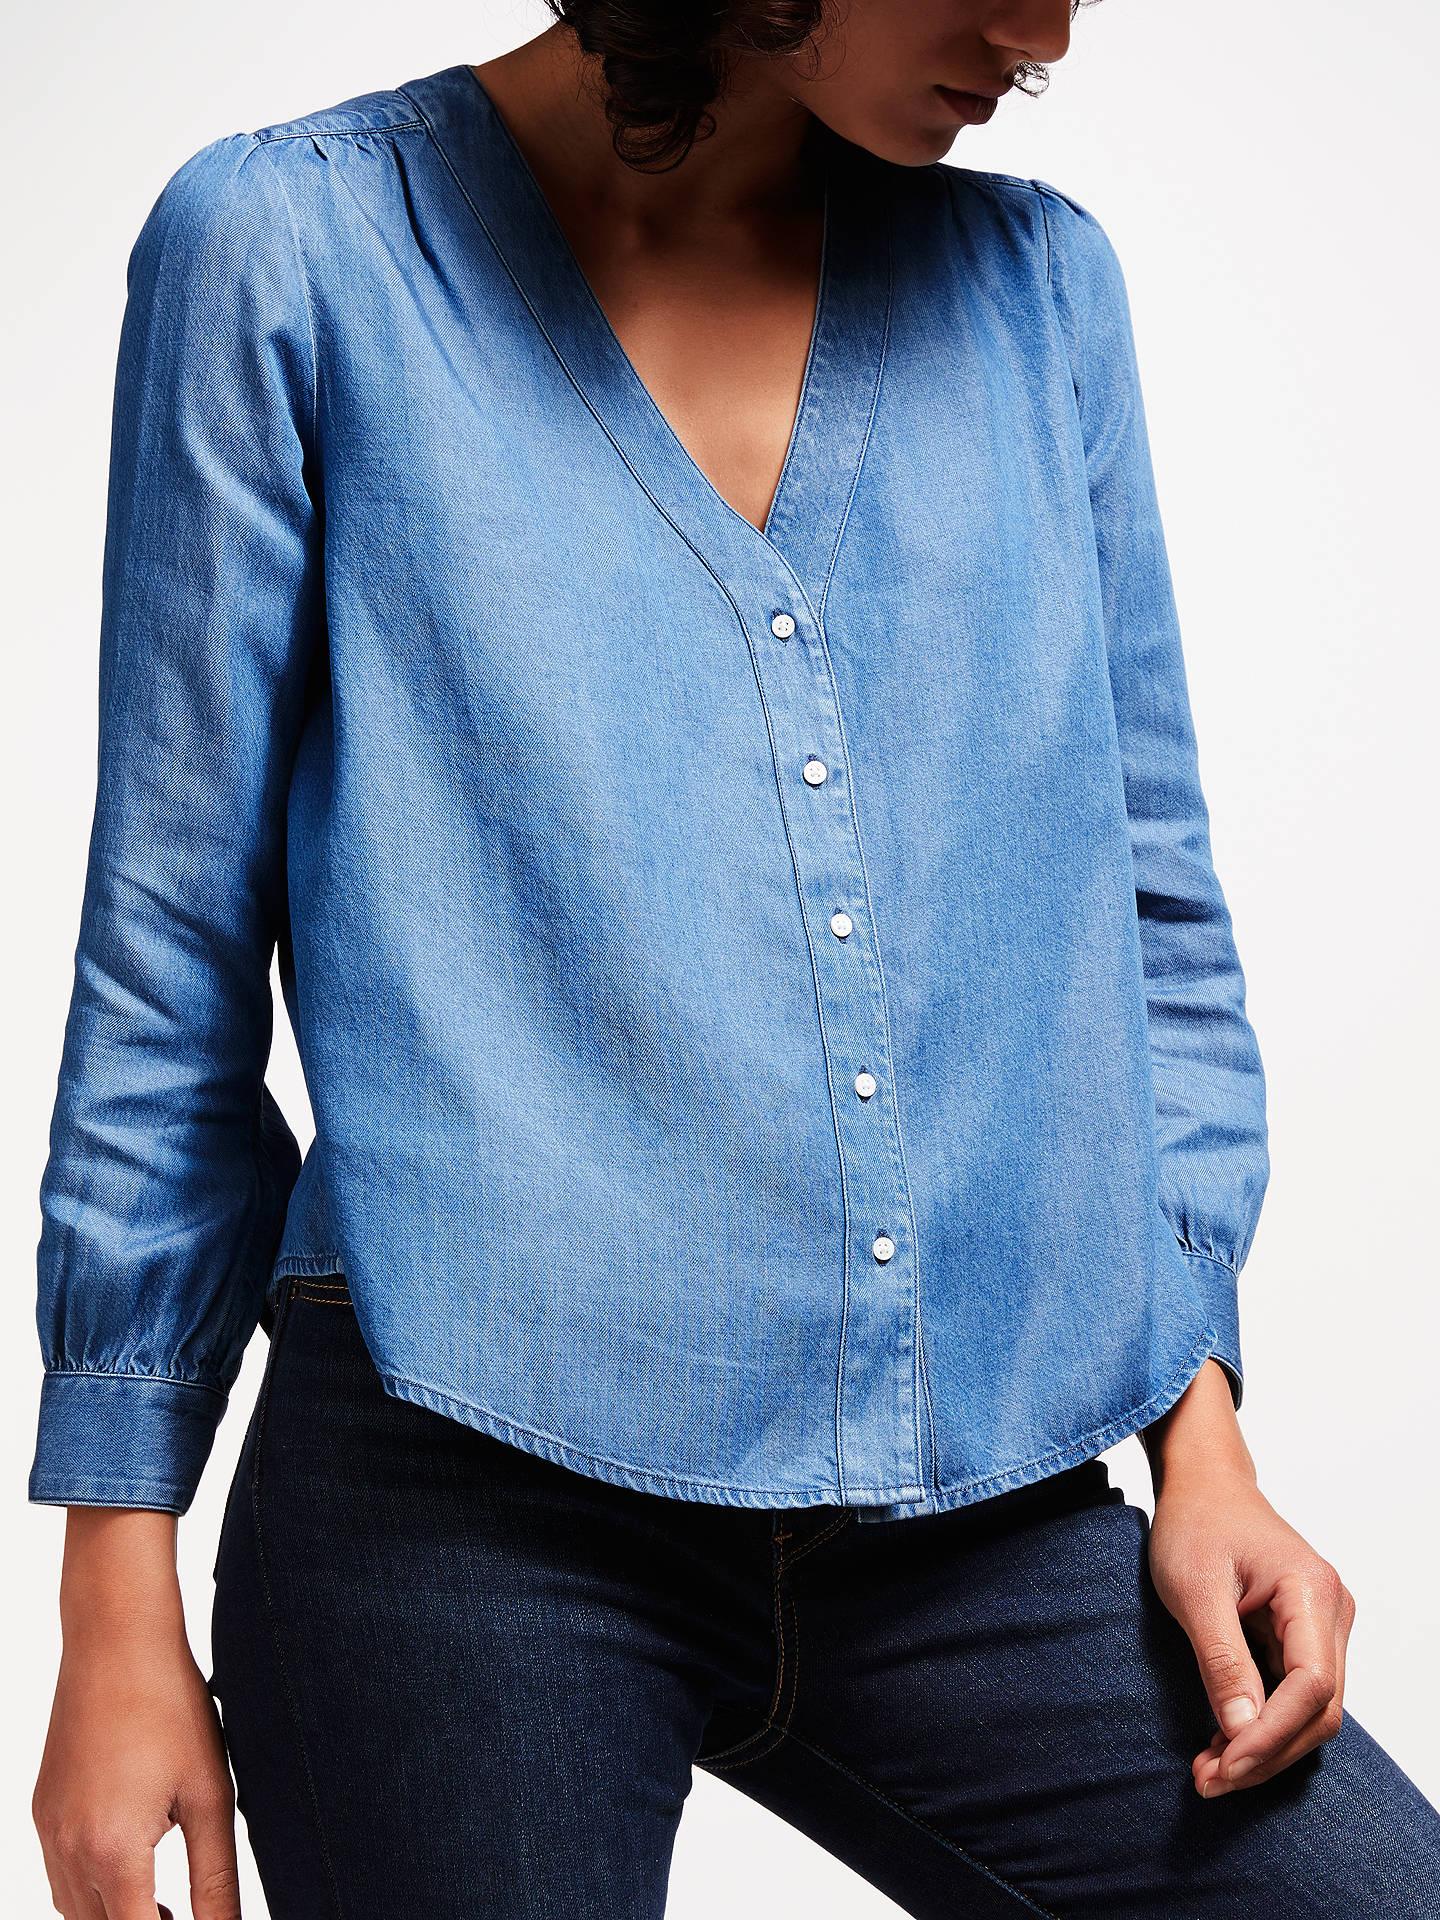 842a76c41d Buy Levi s Malika Denim Shirt